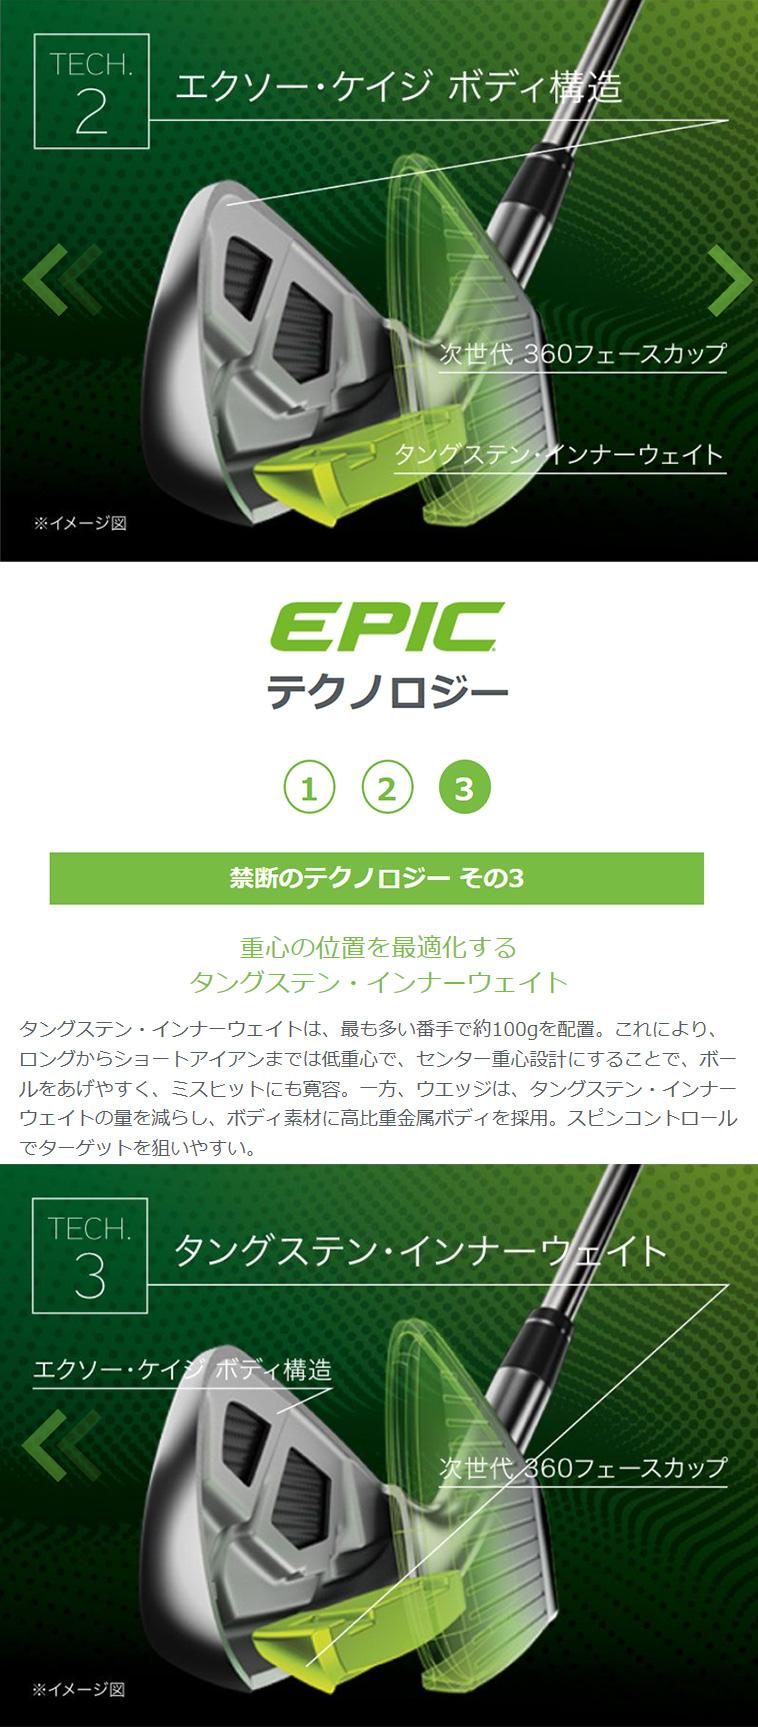 GBB EPIC STAR アイアン GBB EPIC PRO アイアン_2